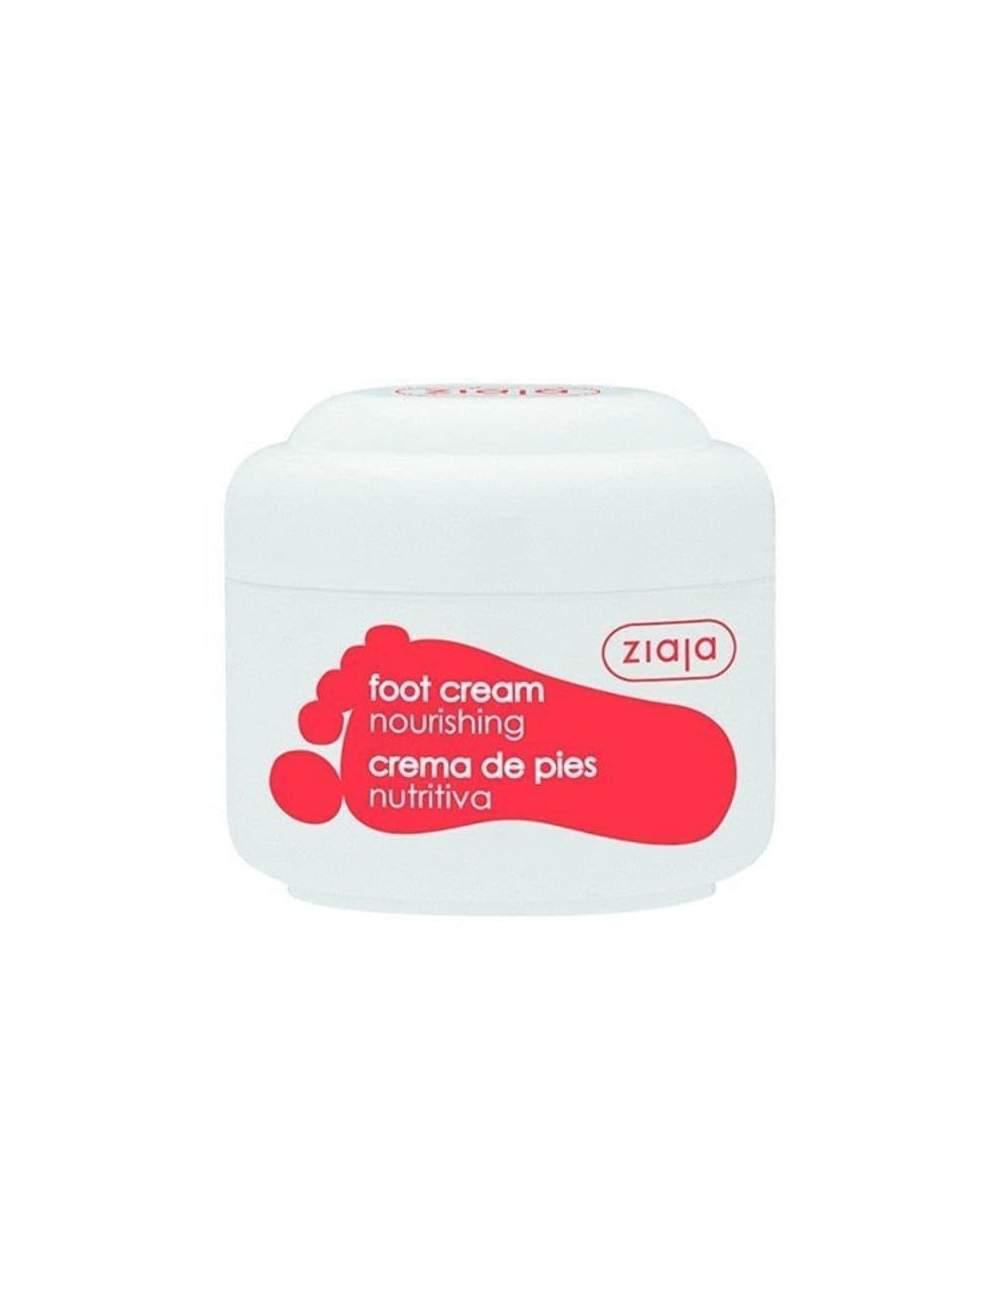 Crema de Pies Natural Nutritiva de Aceite de Oliva. Ziaja